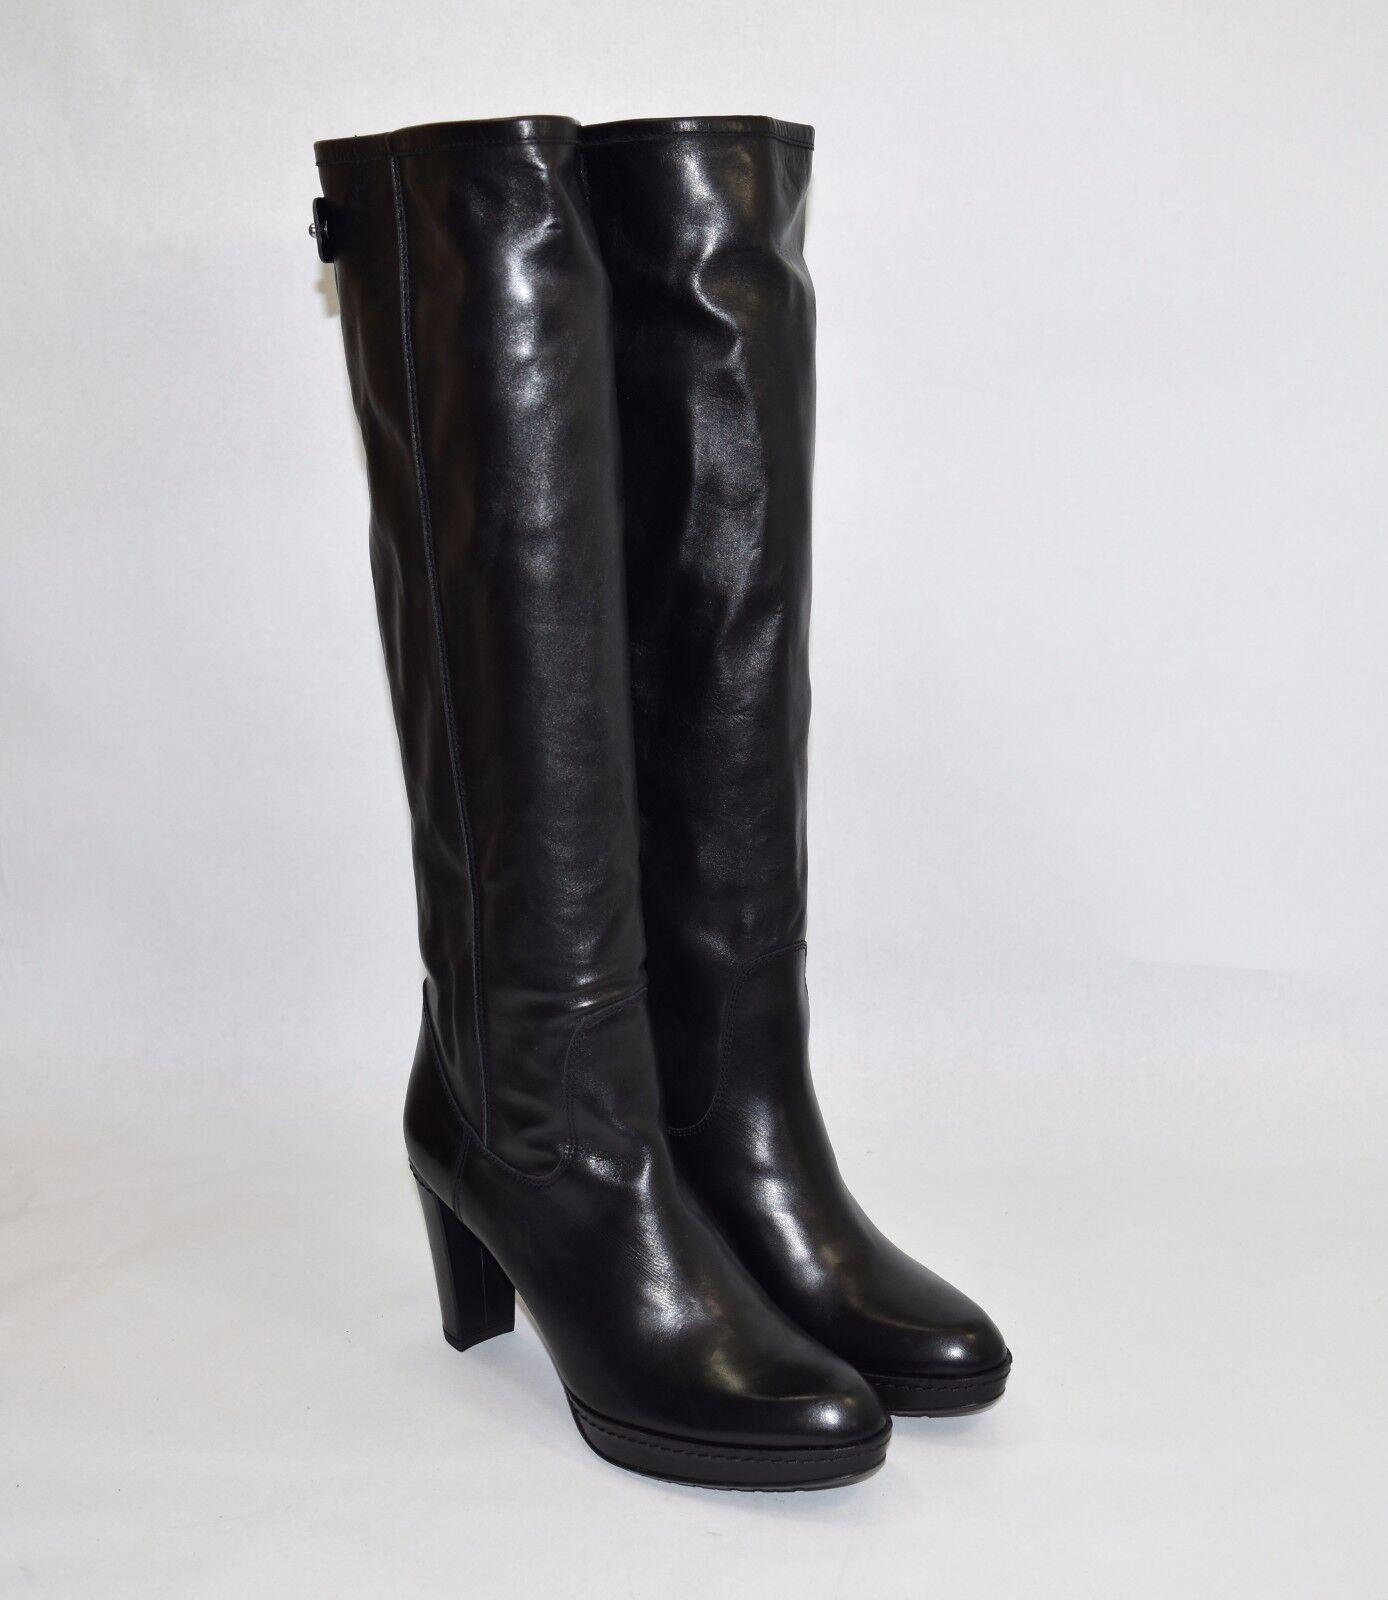 Stuart Weitzman 'Gentry' Almond Toe Platform Boot Black Leather Size 10 M 745